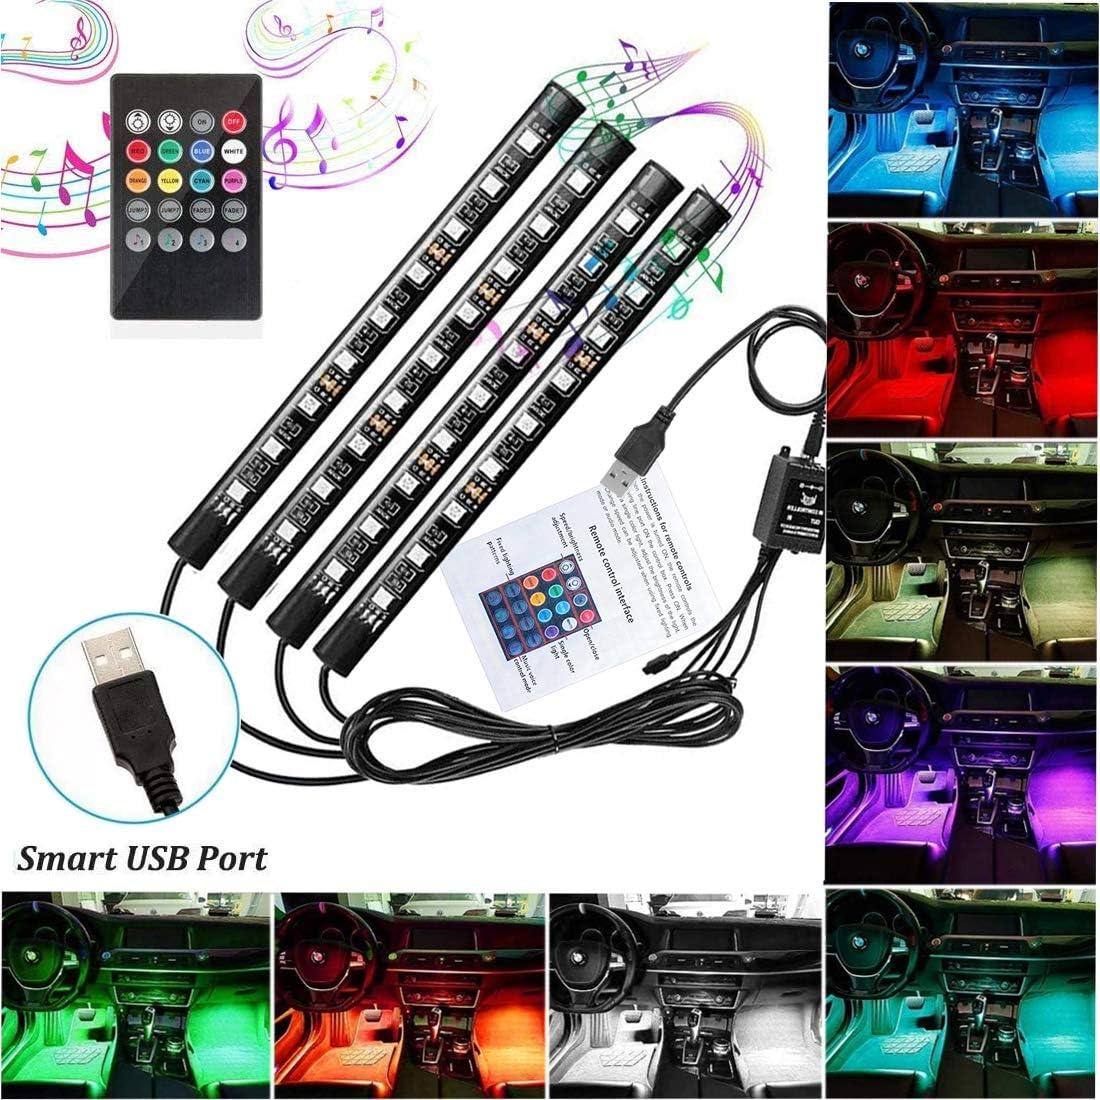 Car LED Strip Lights 72 LED Car Interior Lights USB Atmosphere Neon Lights Underdash Lighting Kit Multicolor RGB with Music Sound Active Wireless Remote Control 5V- 72USB